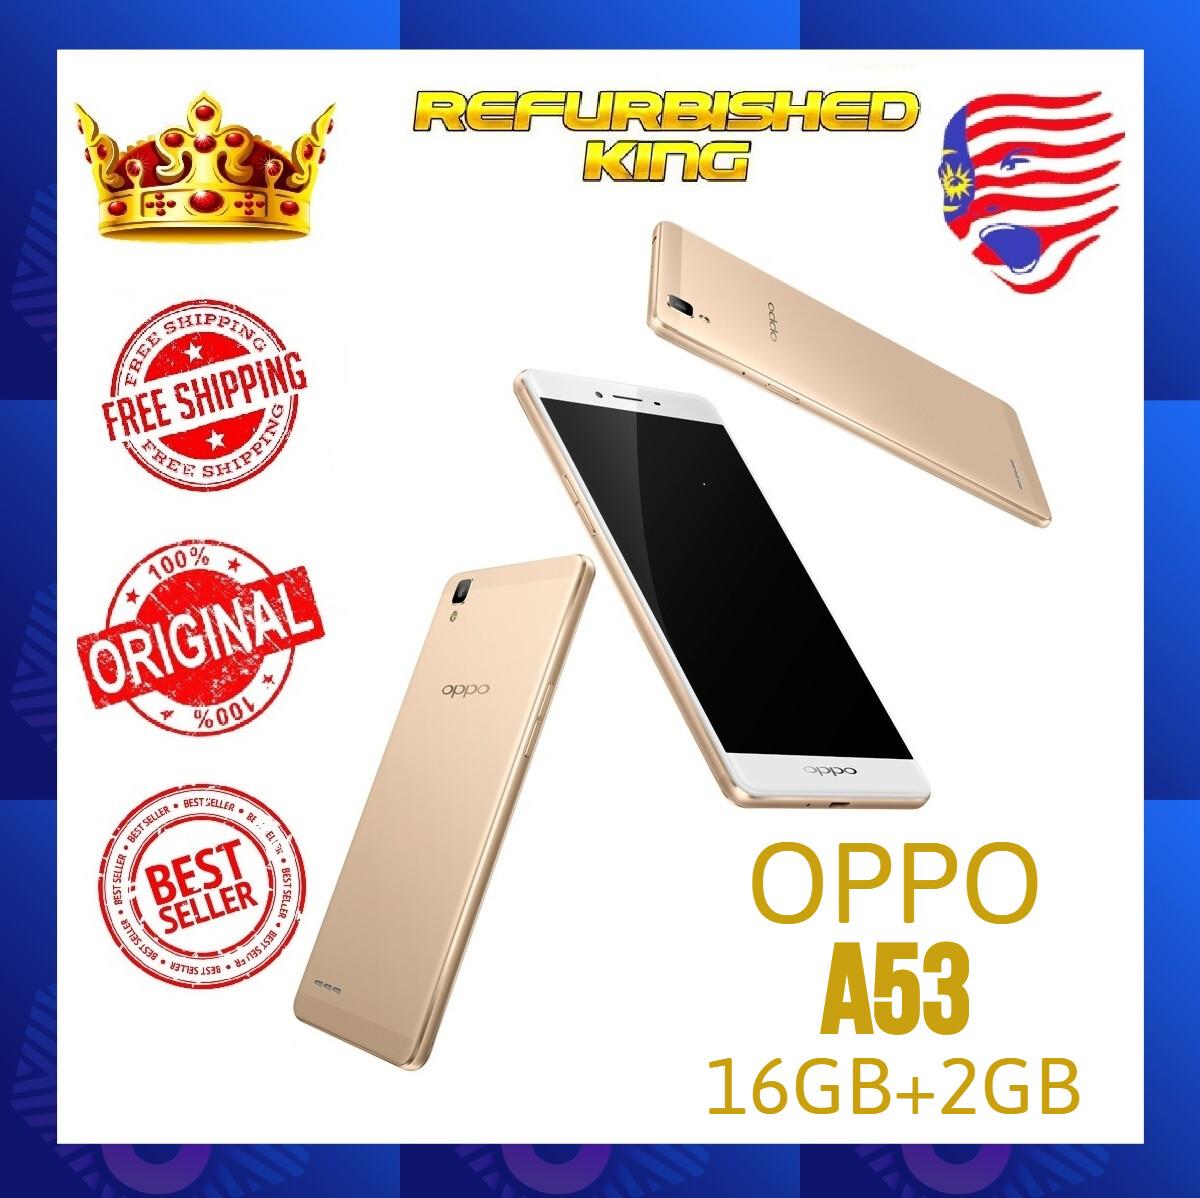 Original Oppo A53 [16GB + 2GB RAM] Dual Sim + FREE Tempered Glass Installed & FREE RM50 Voucher Small